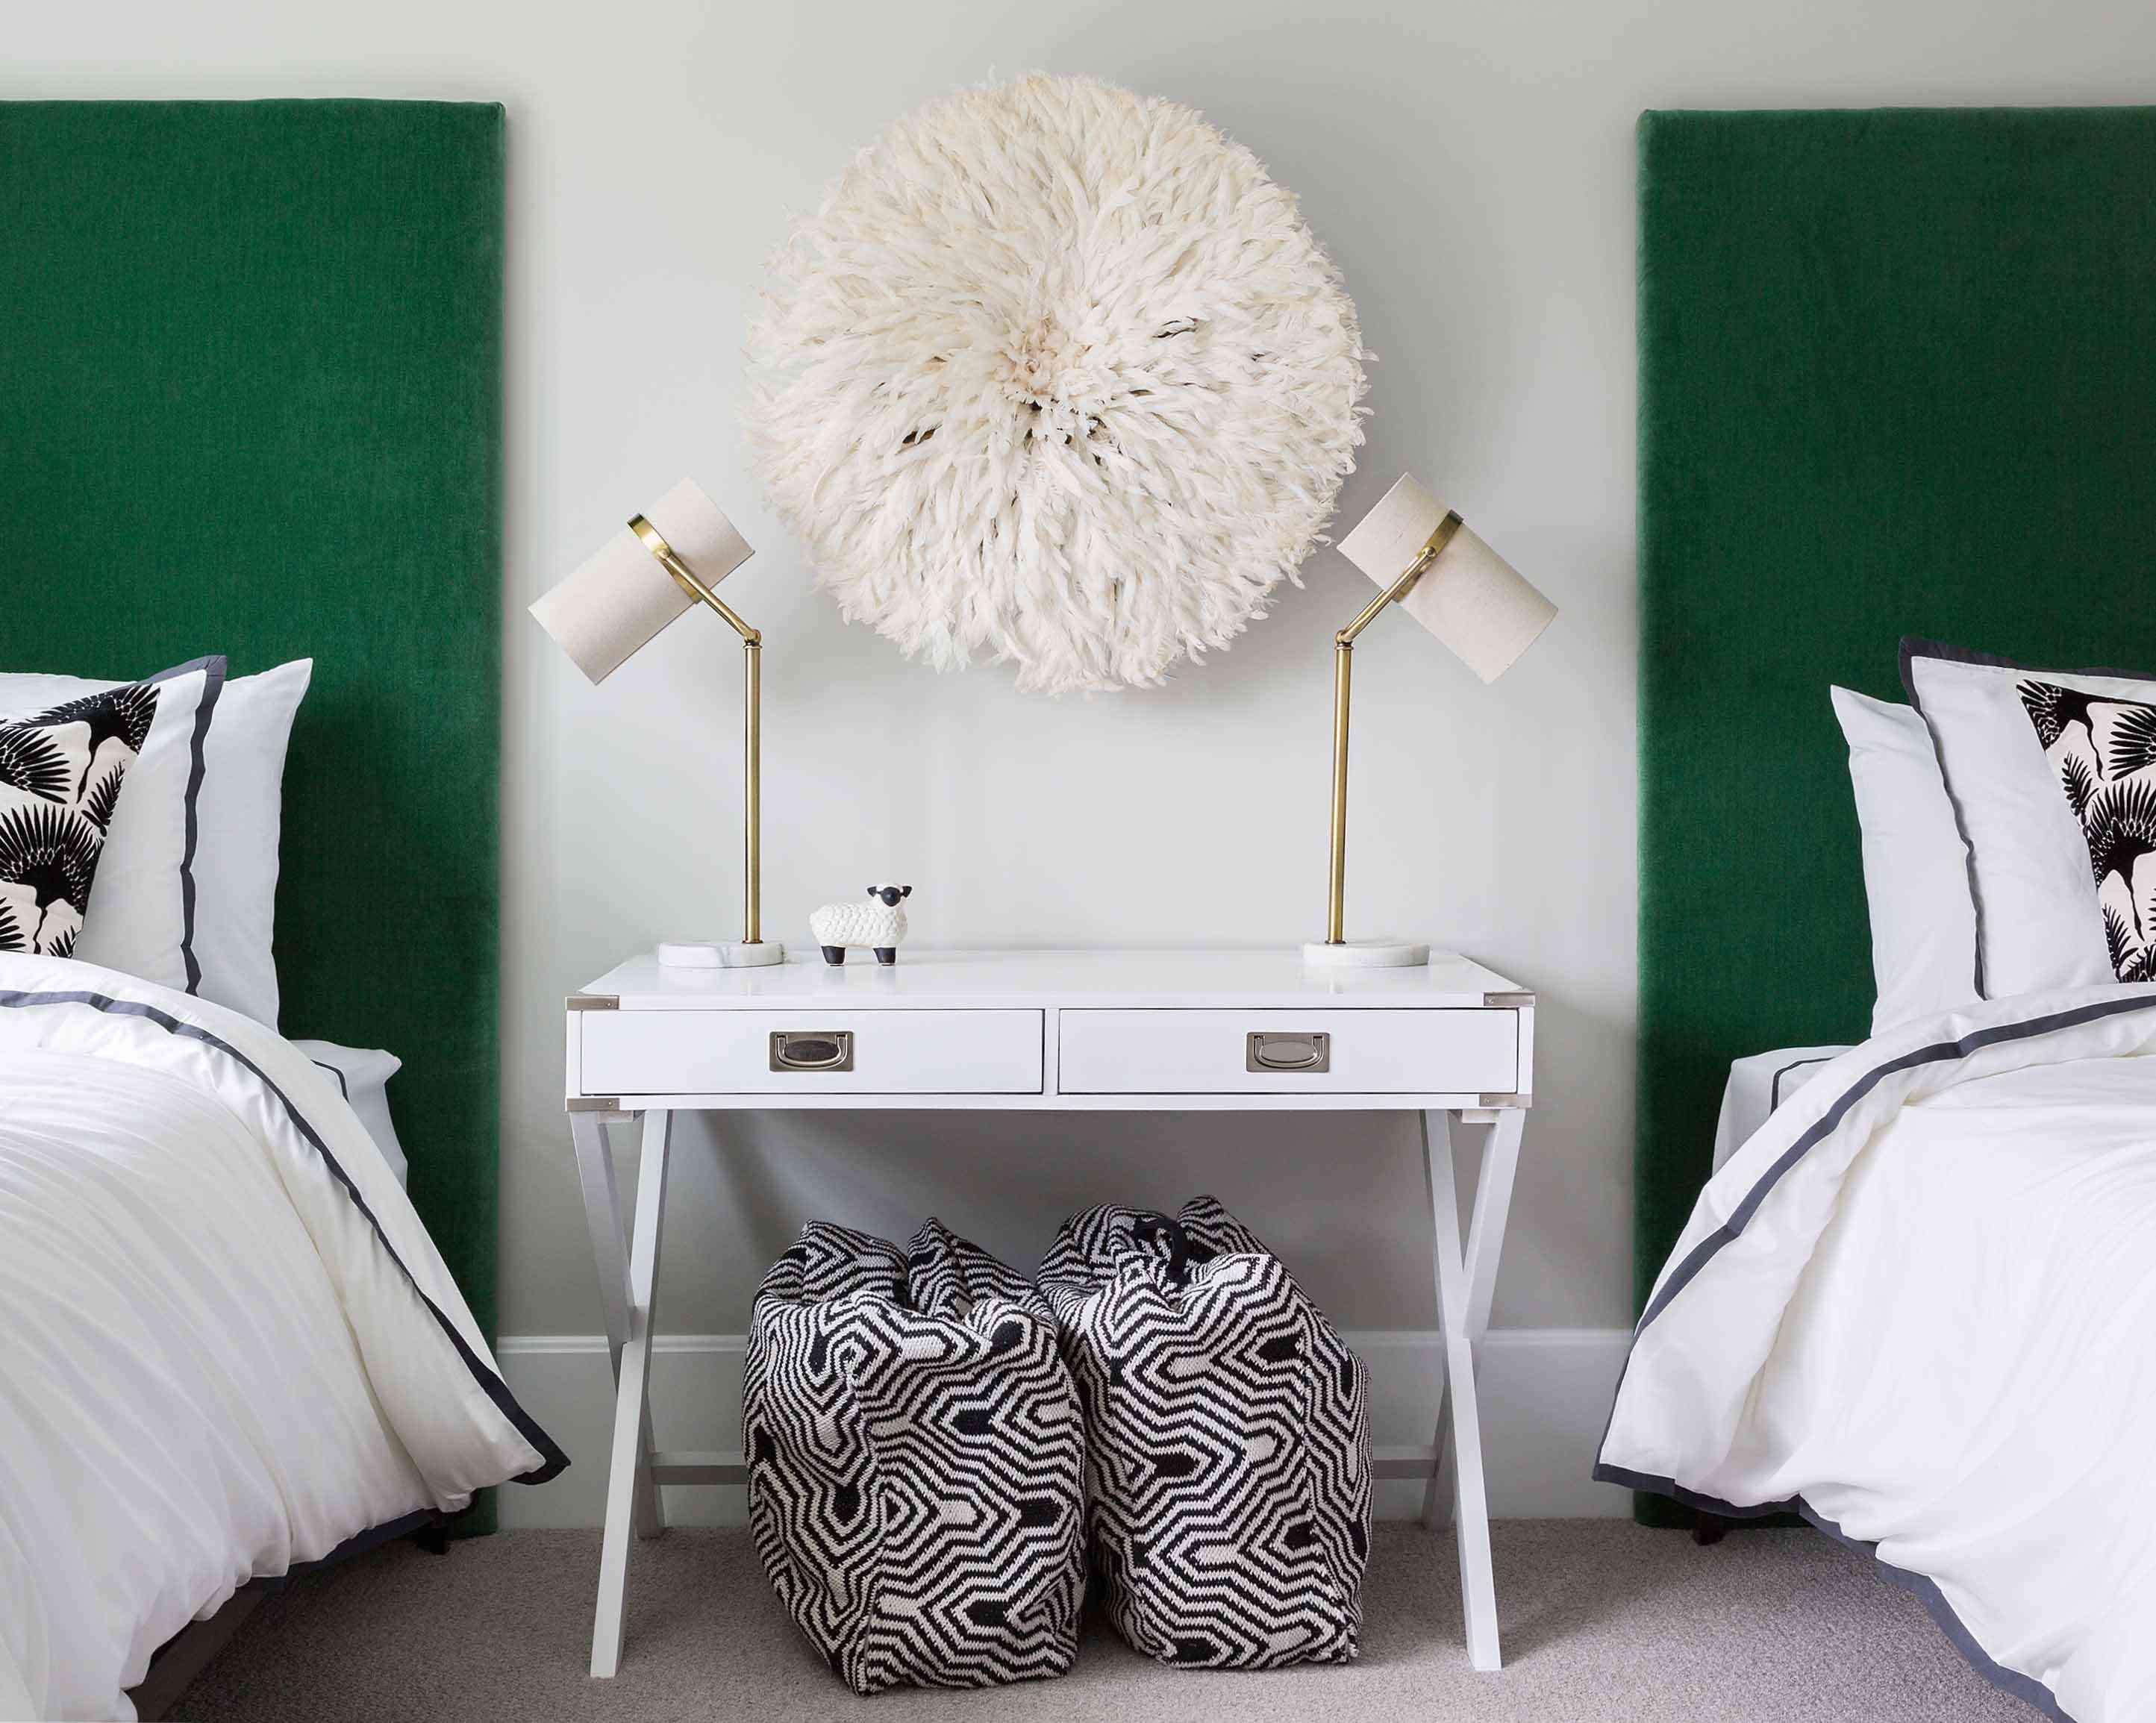 Symmetrical guest bedroom